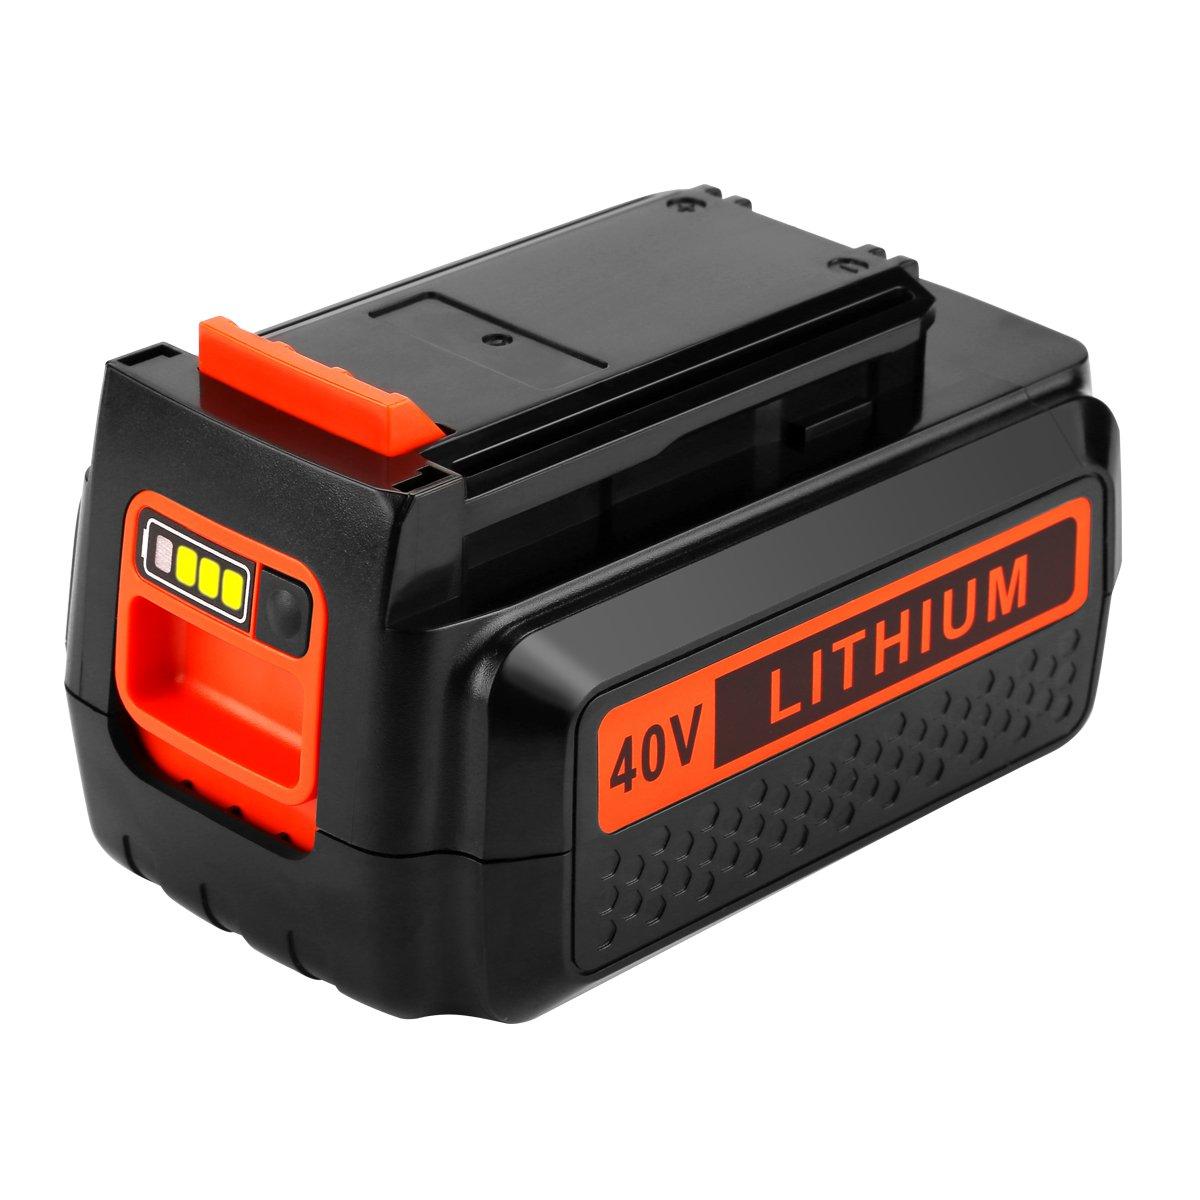 Energup Upgraded Replacement 2500mAh 40 Volt MAX Battery for Black and Decker 40V Battery LBX2040 LBXR36 LBXR2036 LST540 LCS1240 LBX1540 LST136W Black+Decker 40-Volt Lithium Battery